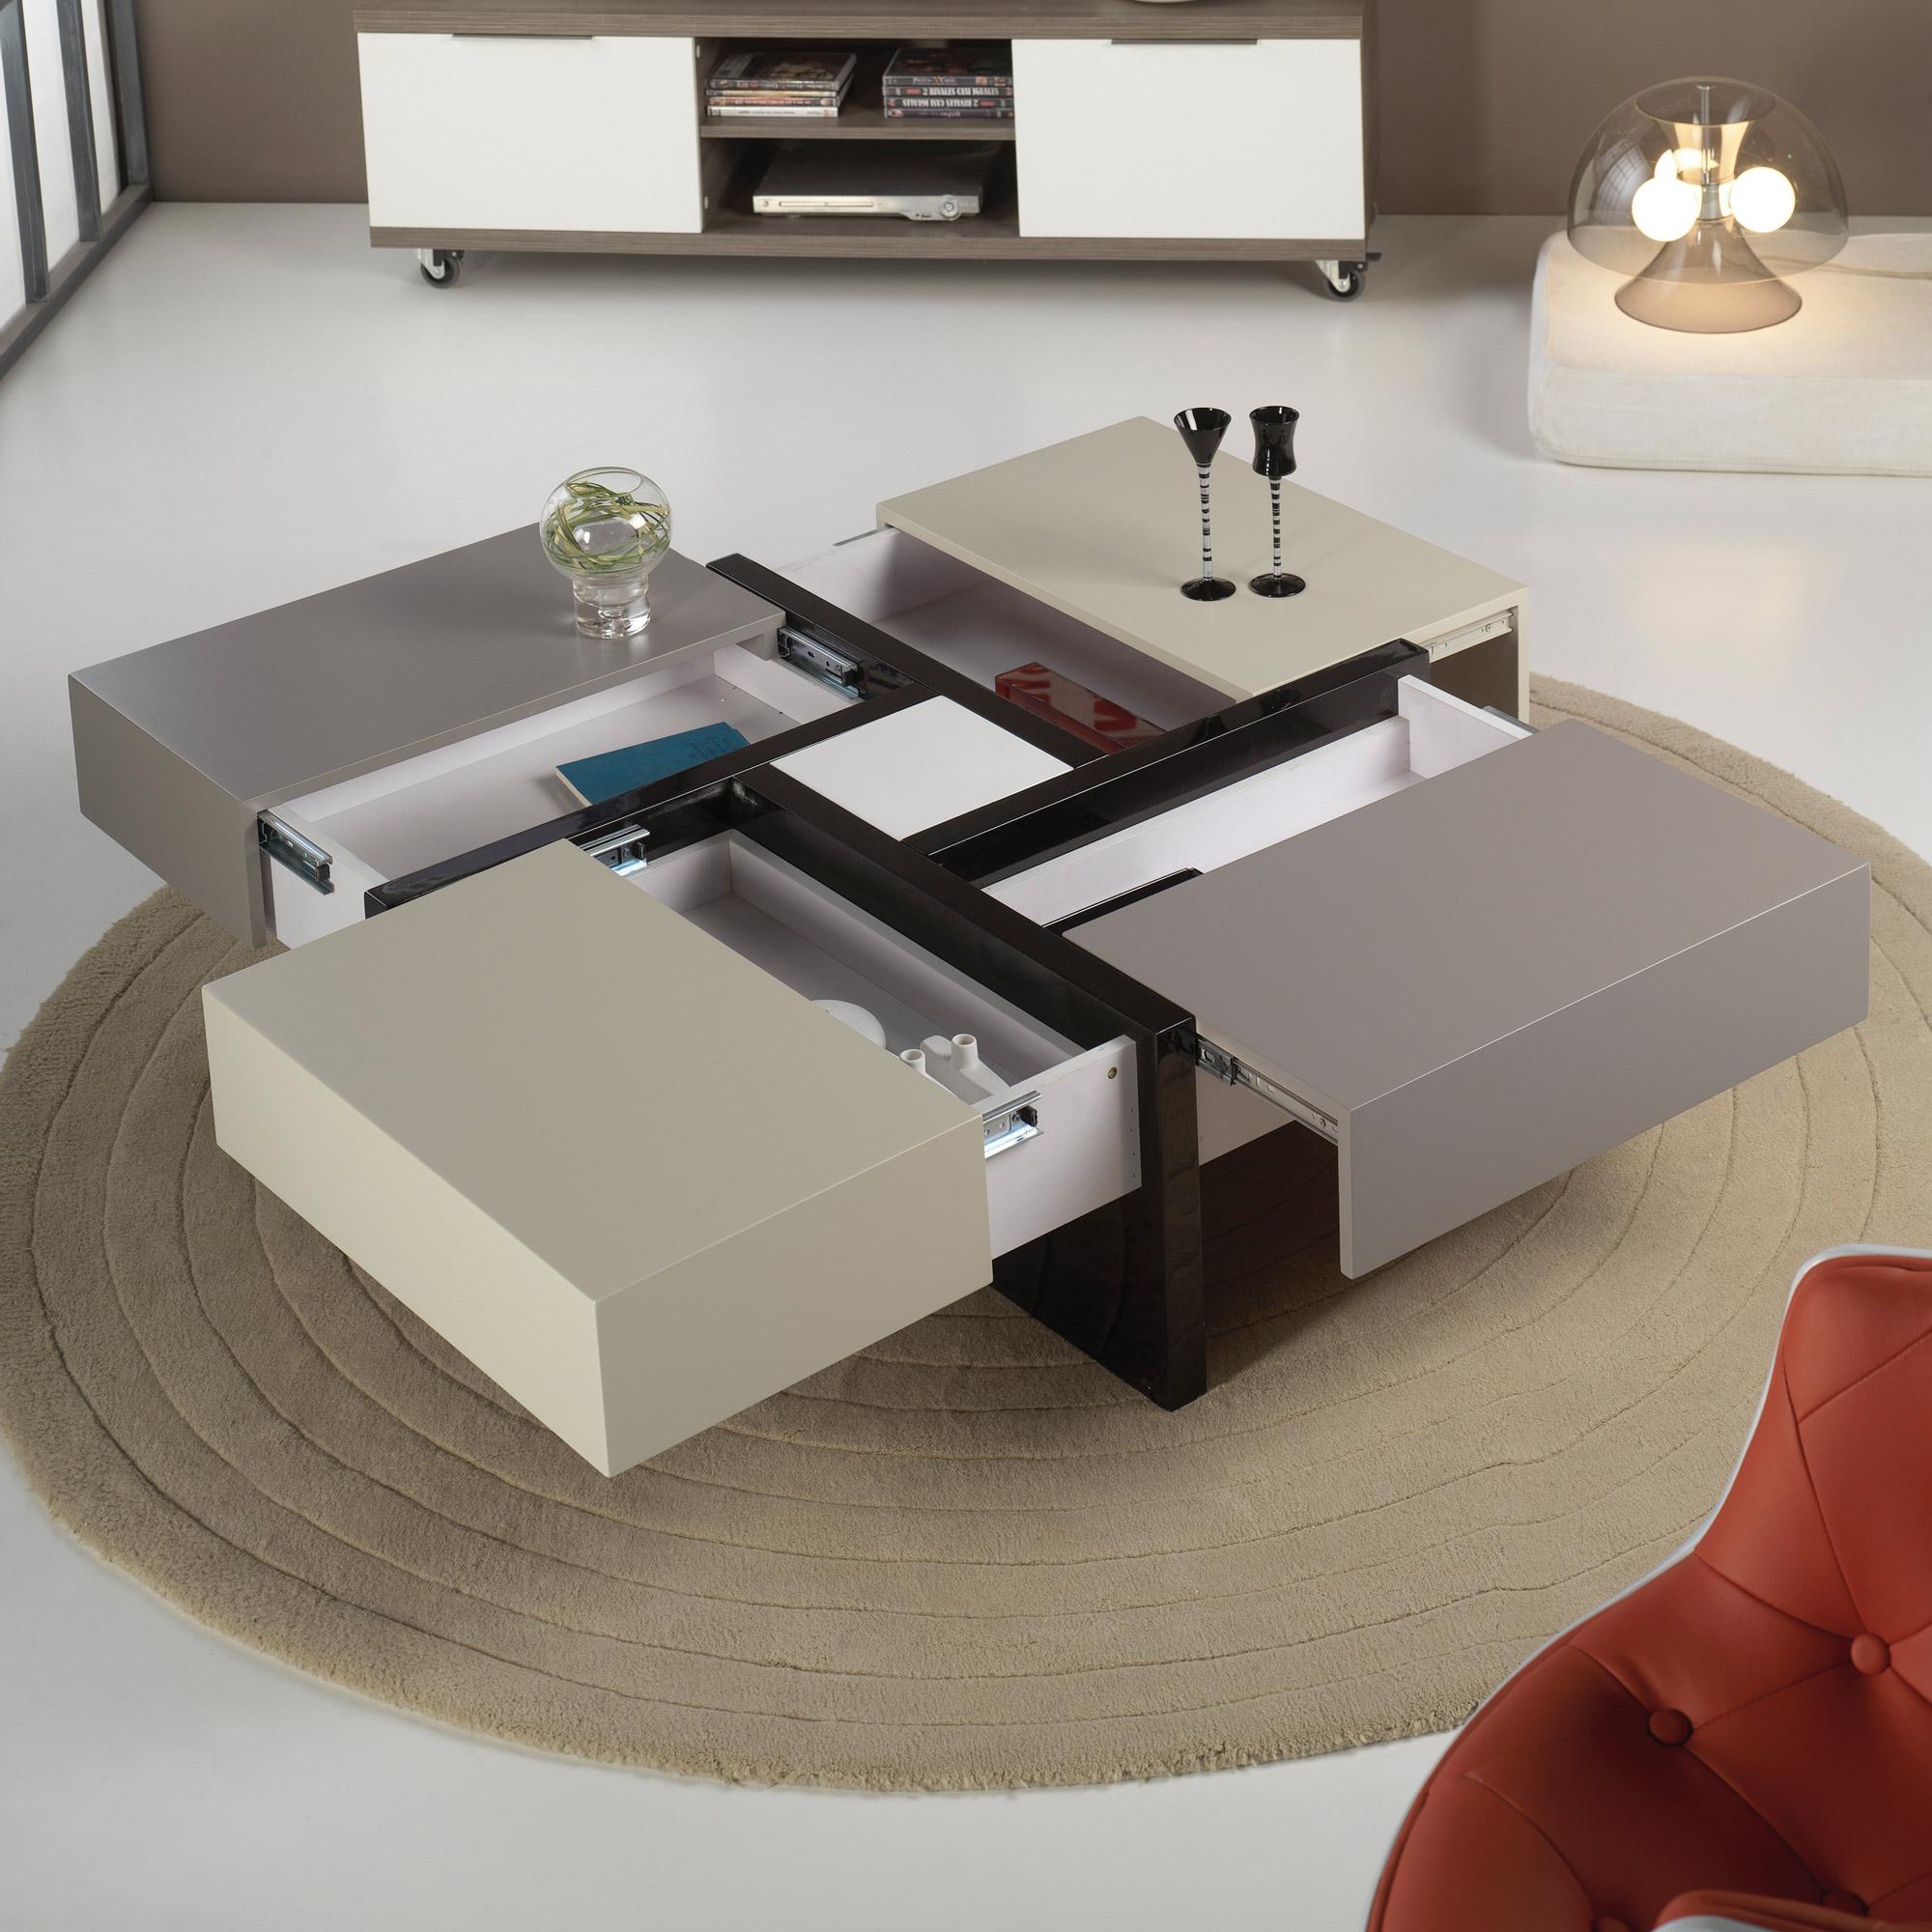 Table basse avec rangement design